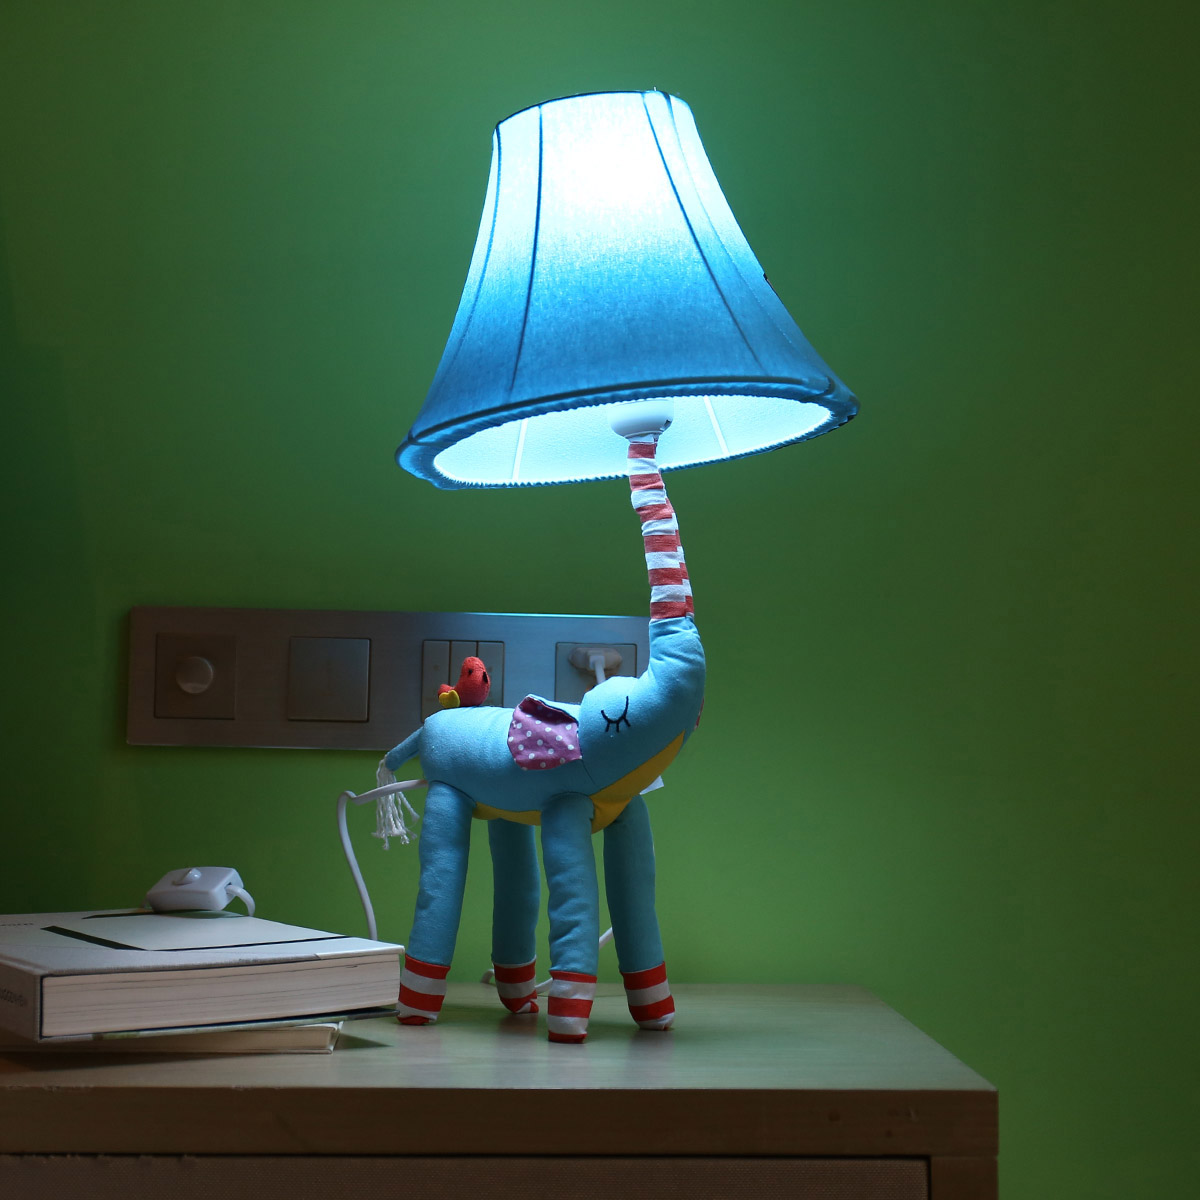 Blue Elephant figurine Lamp Animal figurine Lamp Table Lamp Night Light for Kids Lampshade Bedroom Nursery Room without Led Bulb 5